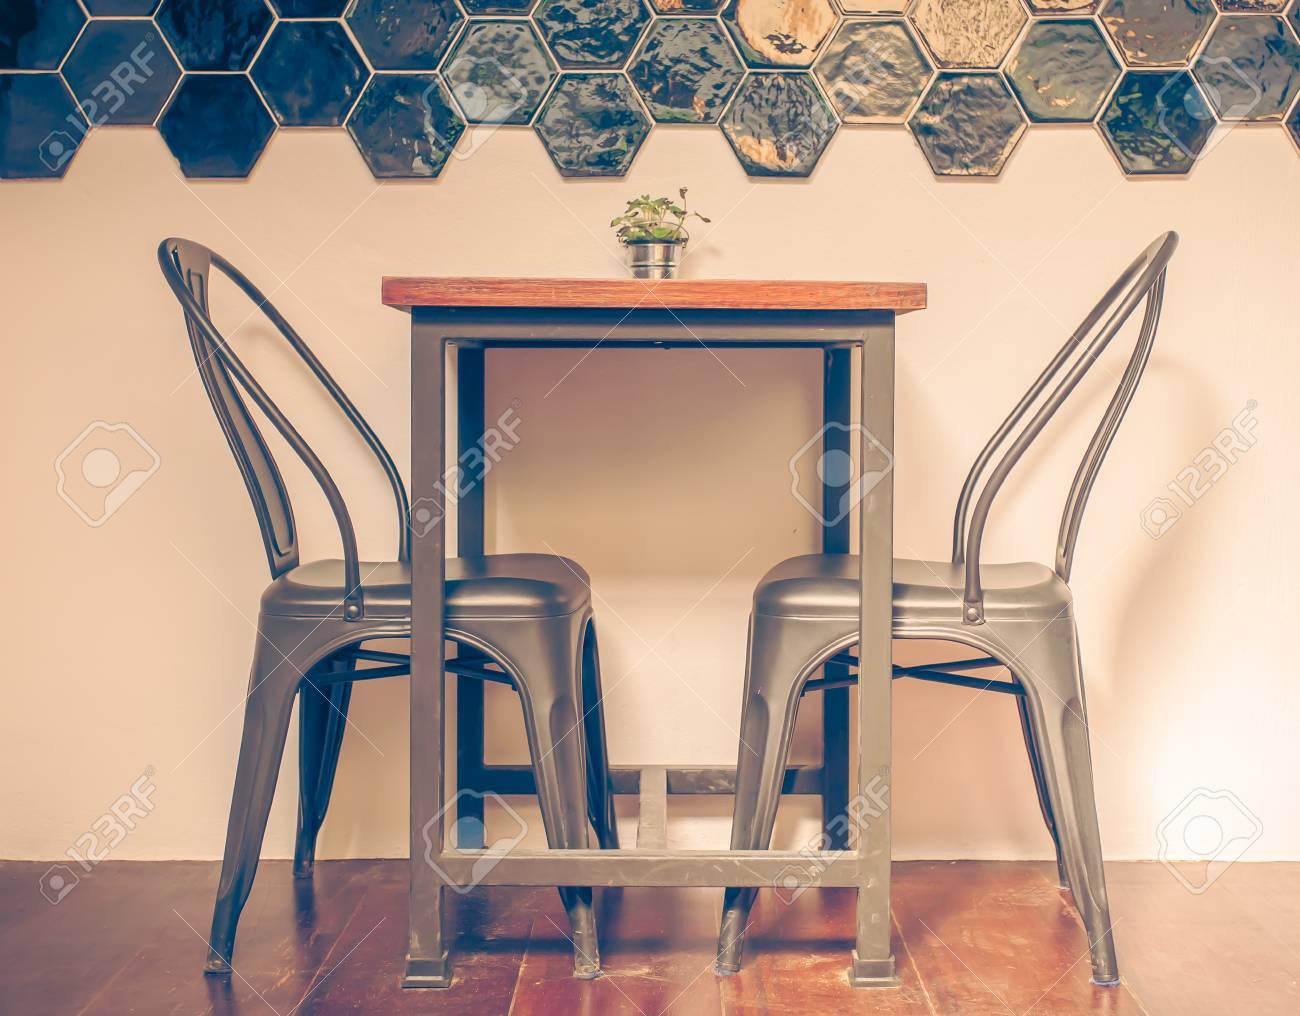 Sedie Depoca : Tavoli e sedie in legno in caffè colore depoca foto royalty free